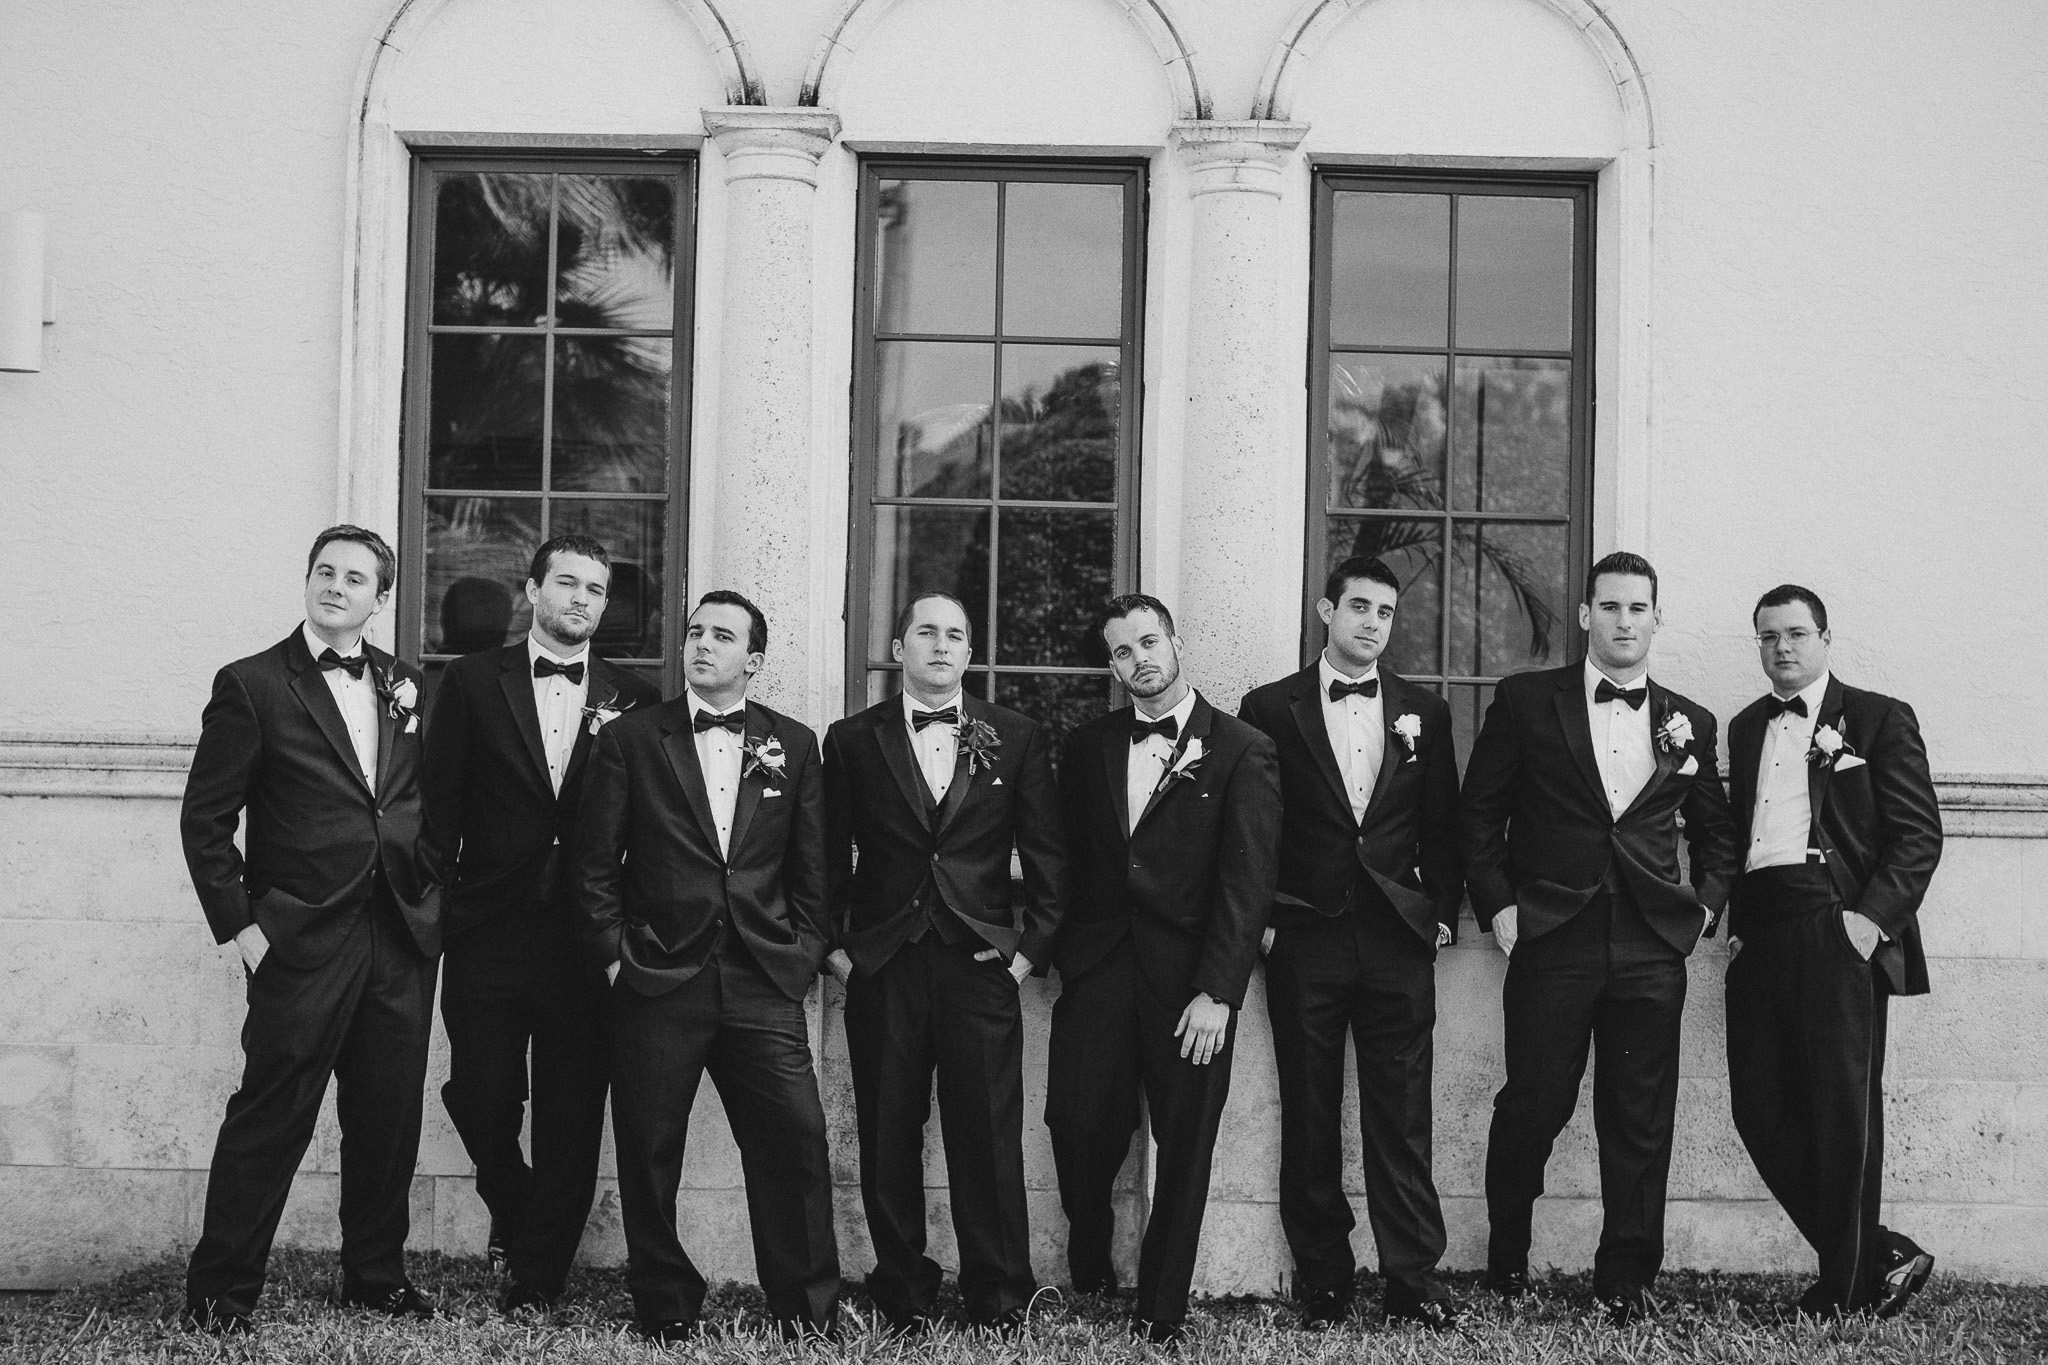 Full Tux Groomsmen Wedding Party